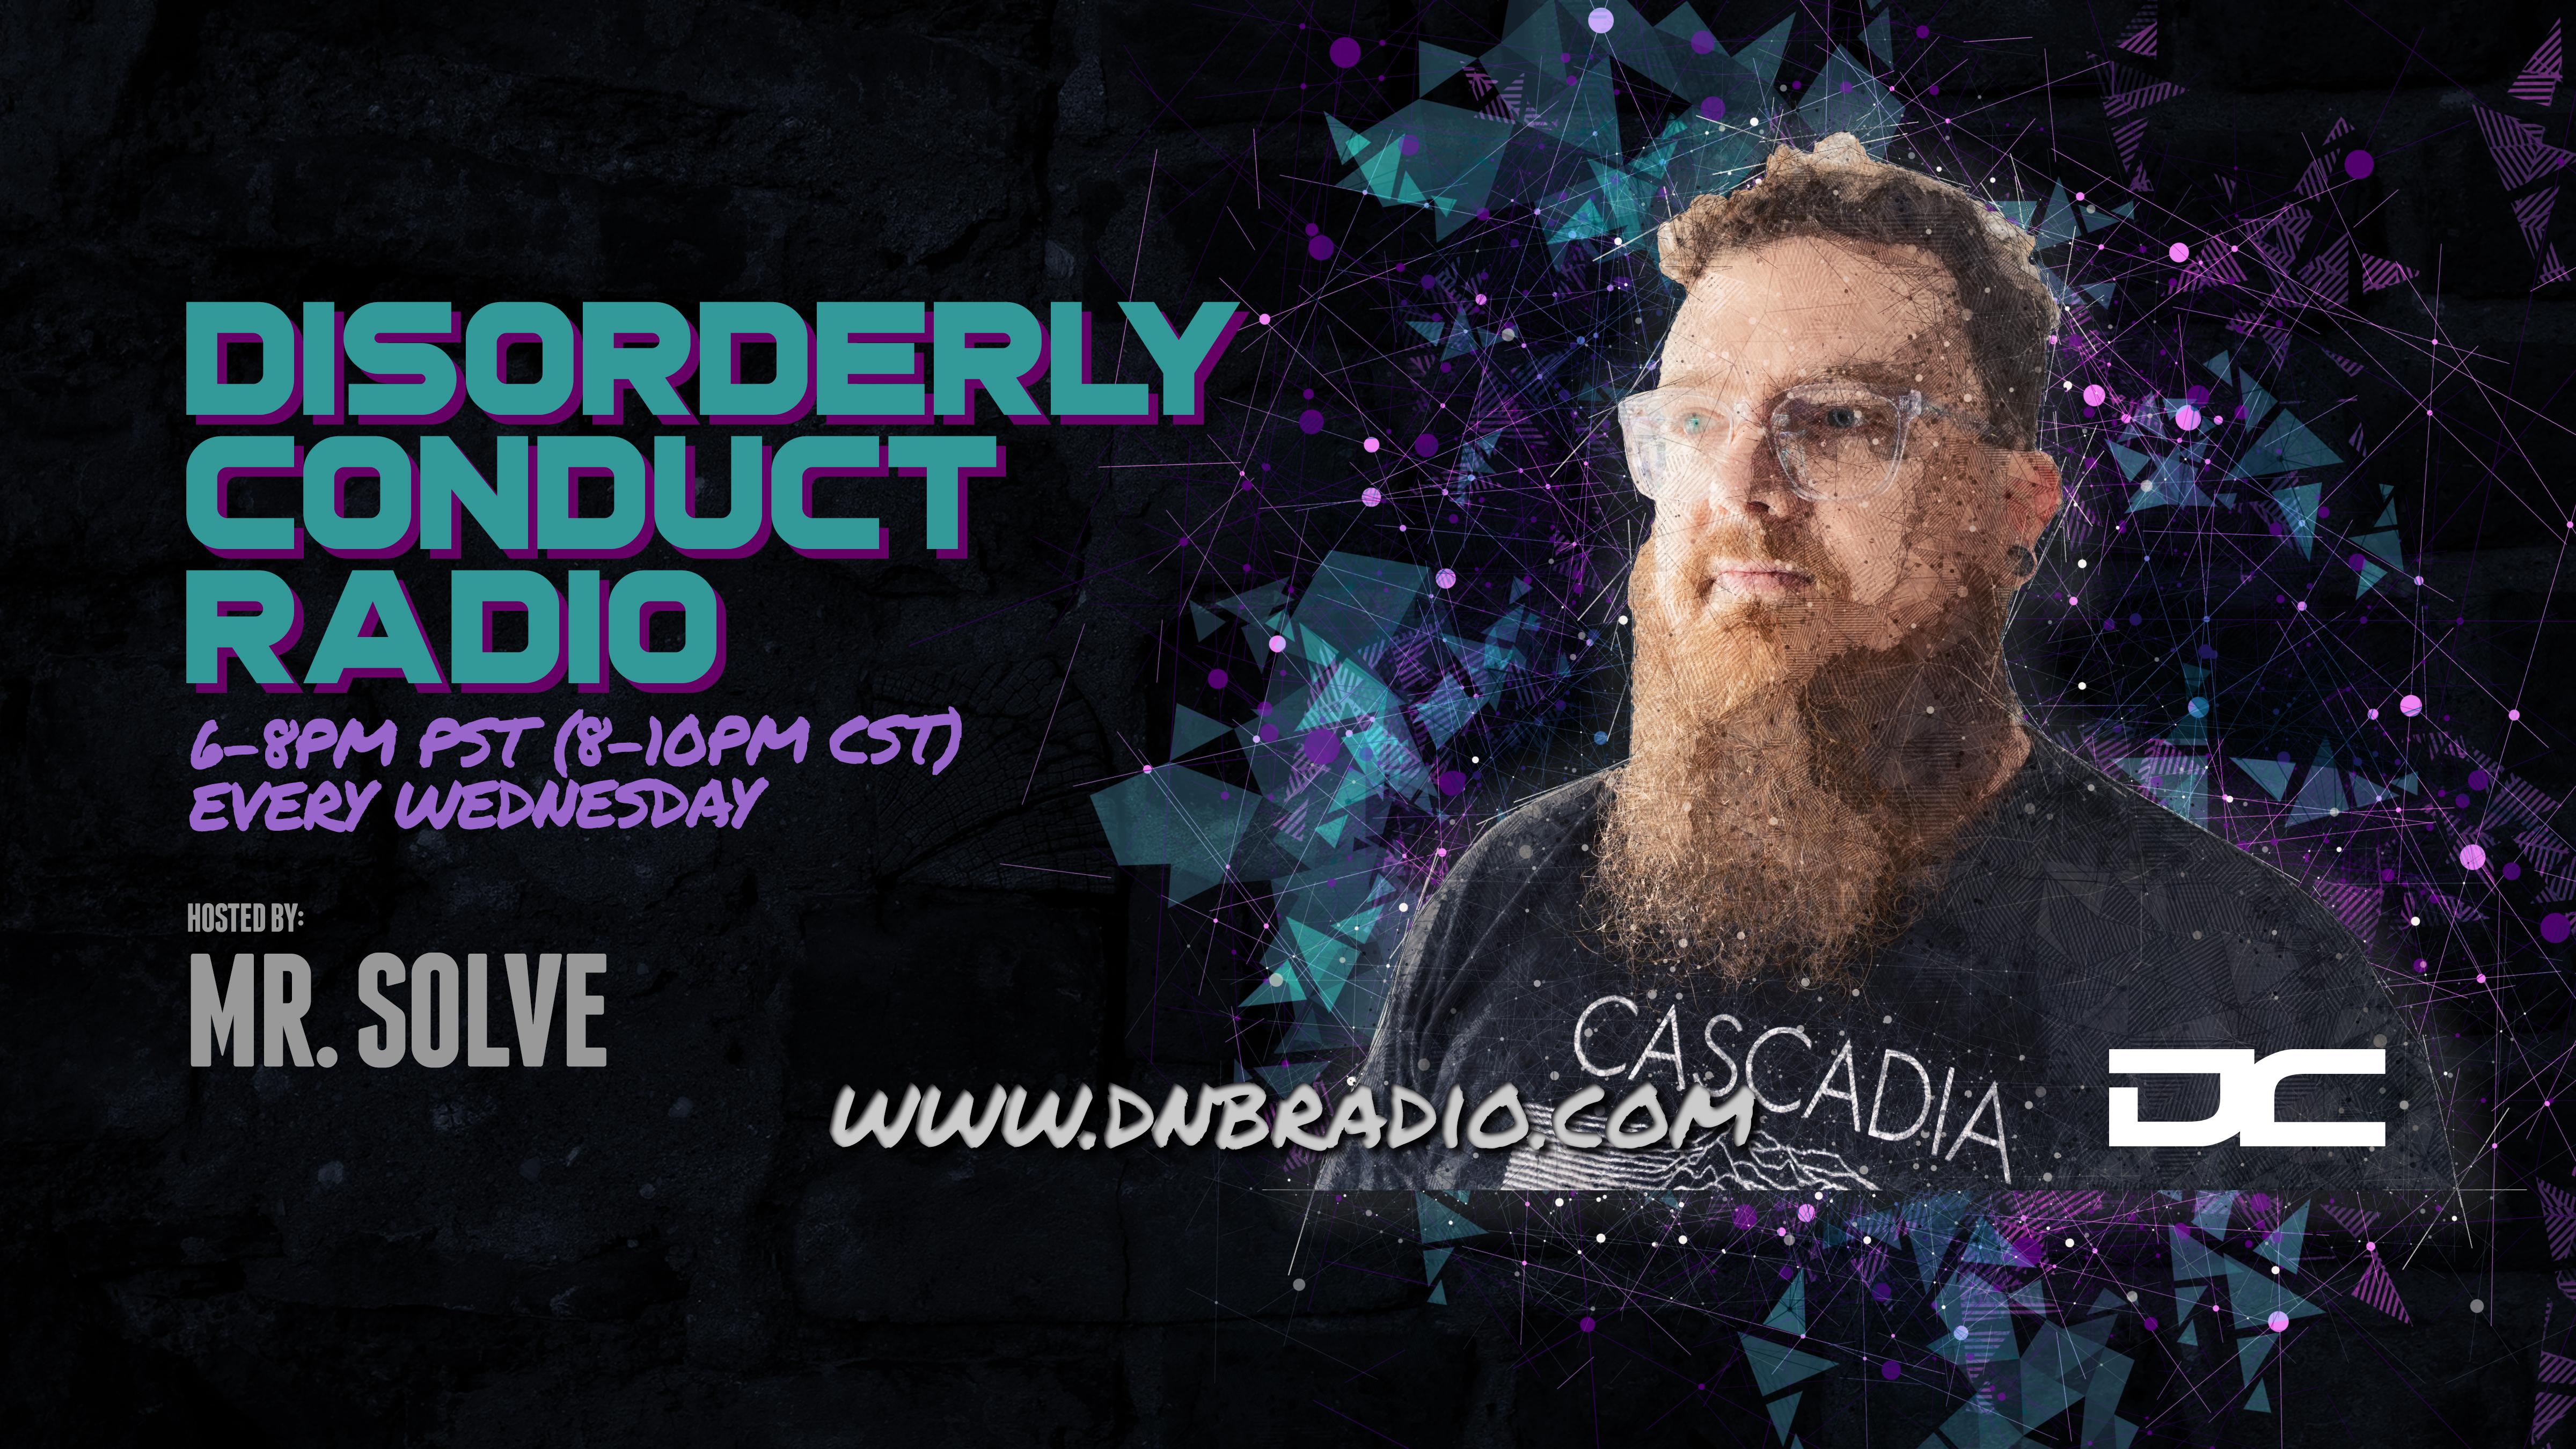 Mr  Solve - Disorderly Conduct Radio 072419 Jul 25 2019 via DNBRadio